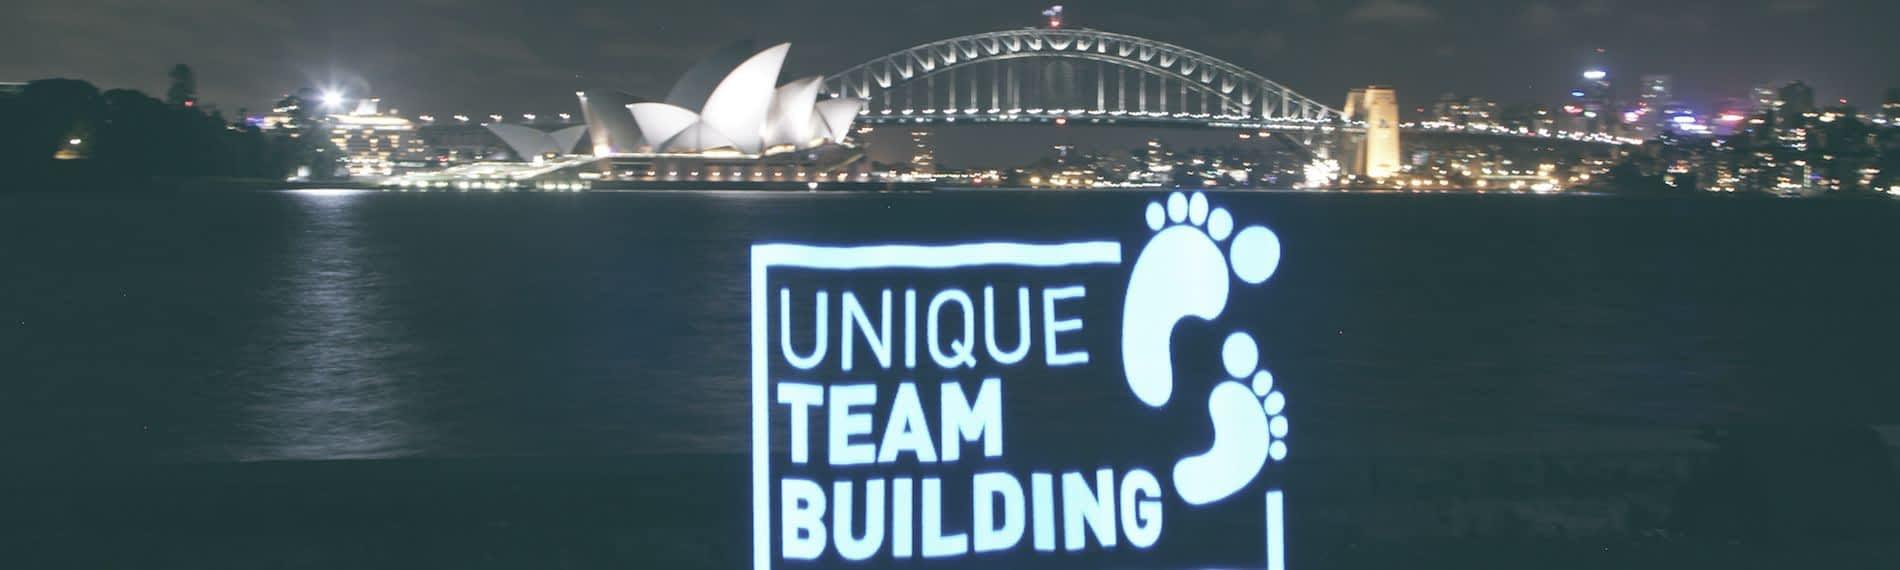 https://mlcb8szwyxfv.i.optimole.com/tTCGqh8-hoo68Ngz/w:auto/h:auto/q:62/https://www.uniqueteambuilding.com.au/wp-content/uploads/2015/01/team-building-default-rot-1.jpg